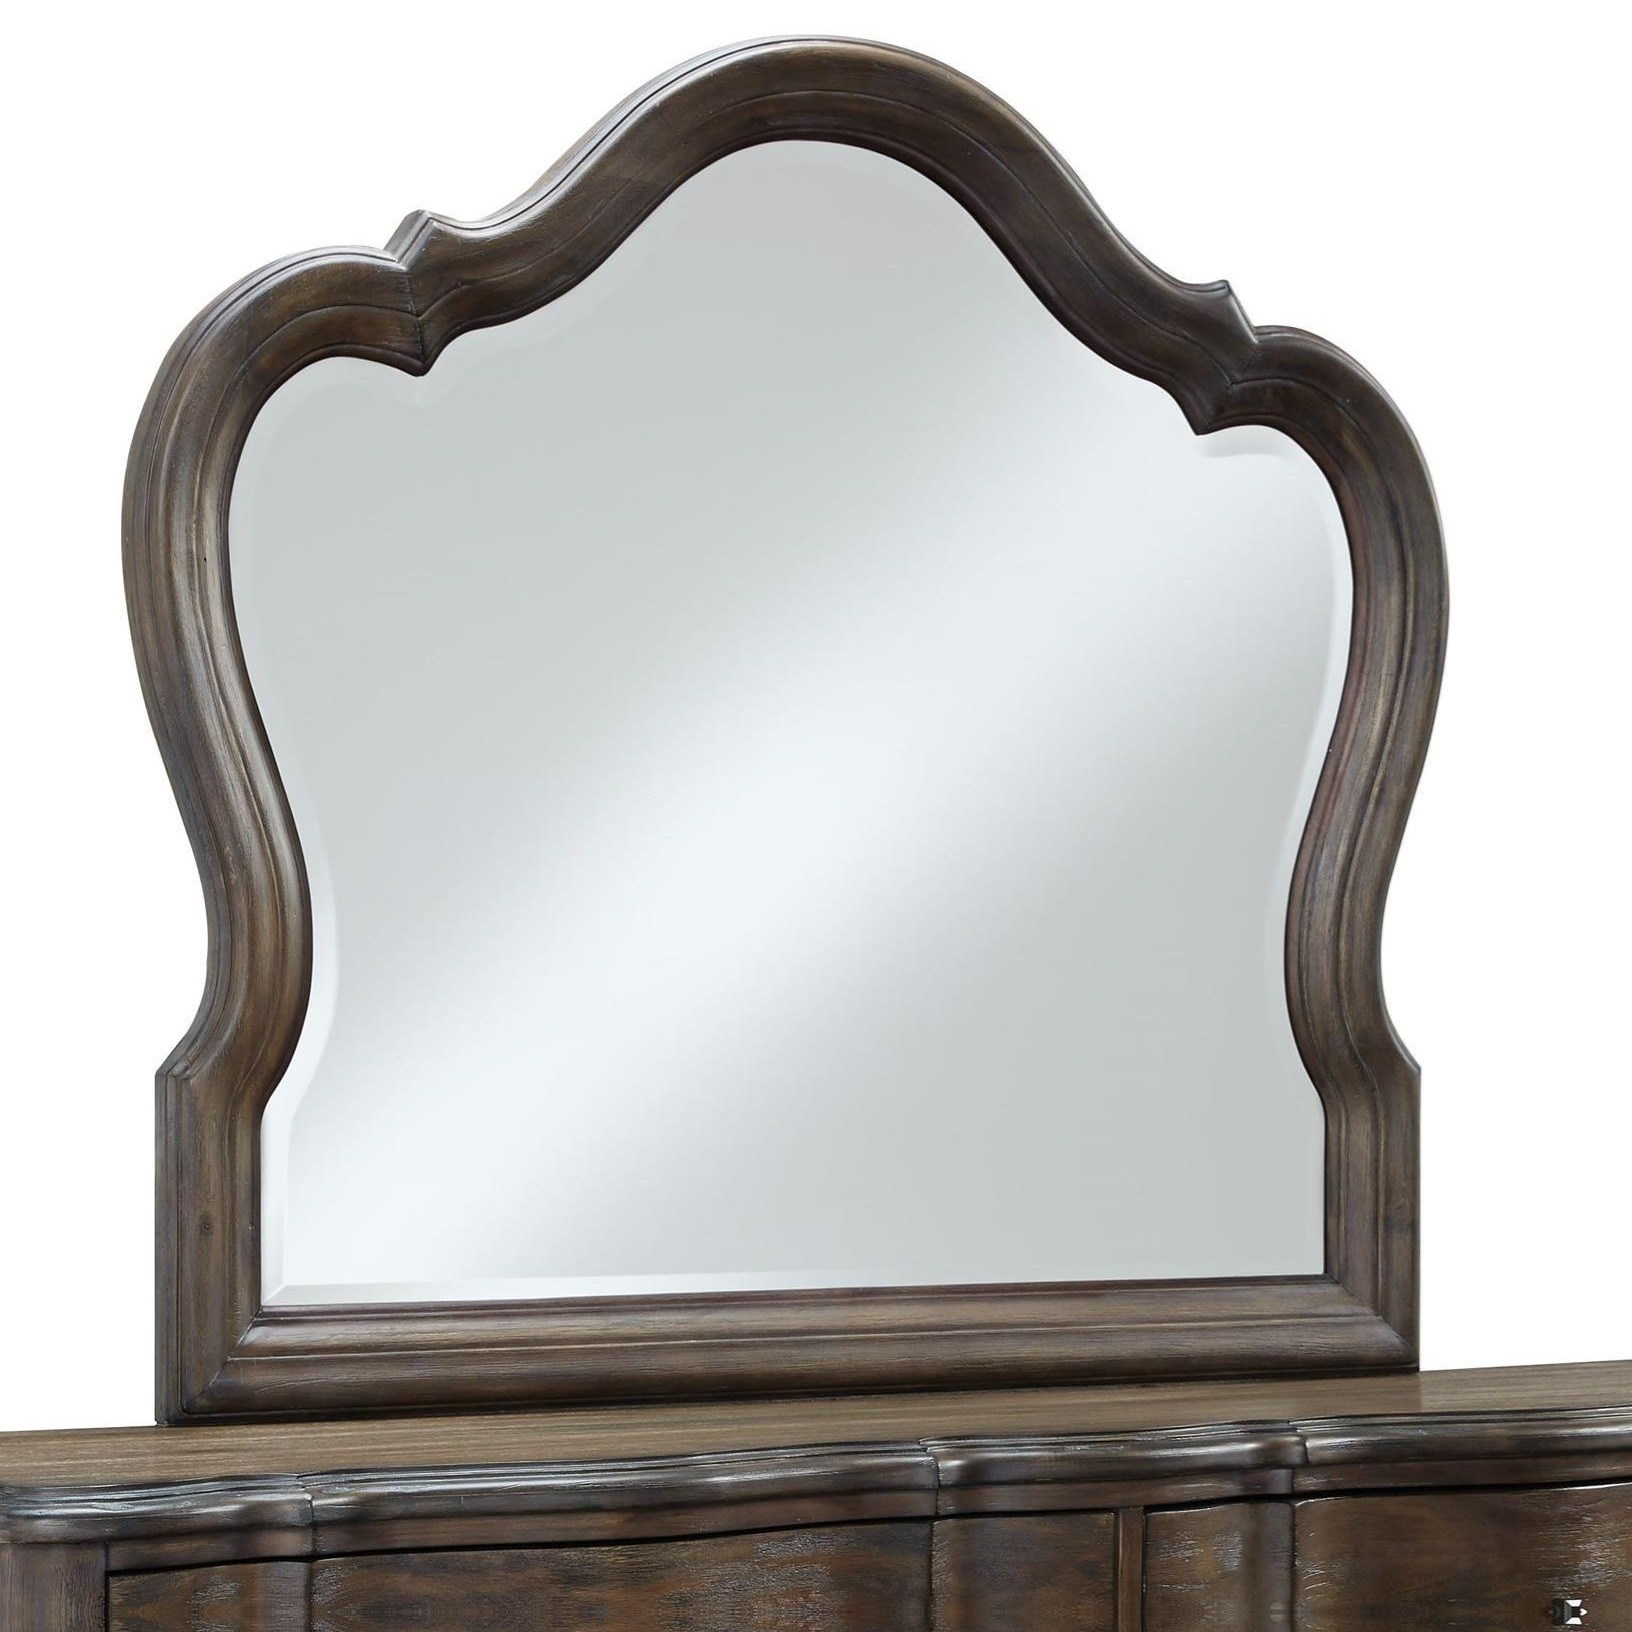 Standard Furniture Parliament Mirror - Item Number: 92358